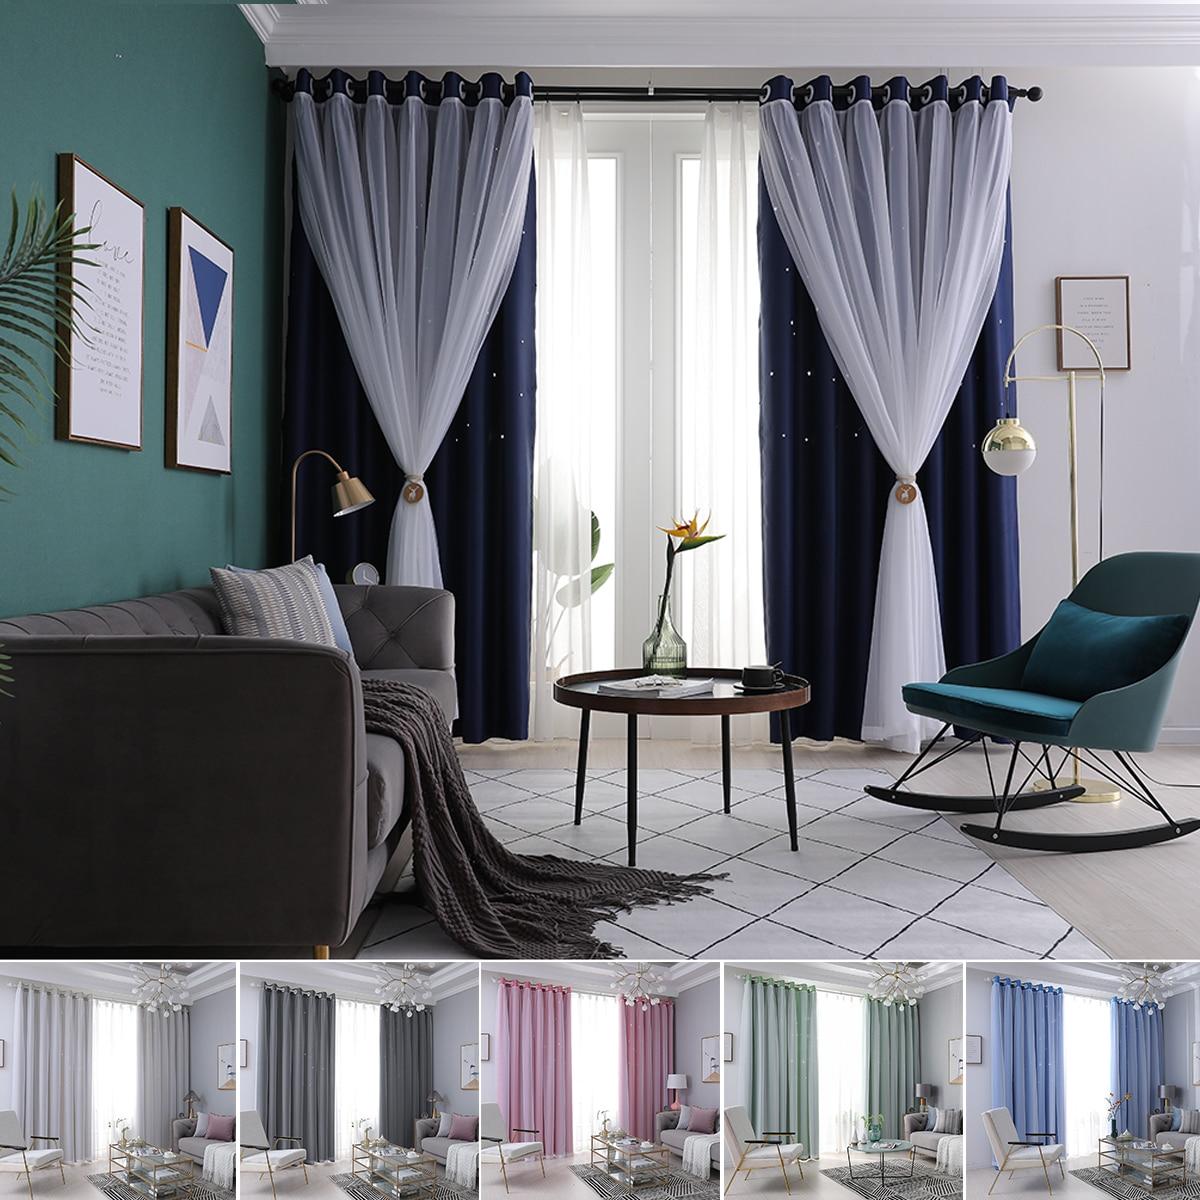 Cortina de cortina superpuesta de doble capa de tul, cortina de hilo estrella con ojal para ventana, cortinas de ventana cortadas sólidas decorativas para dormitorio D40